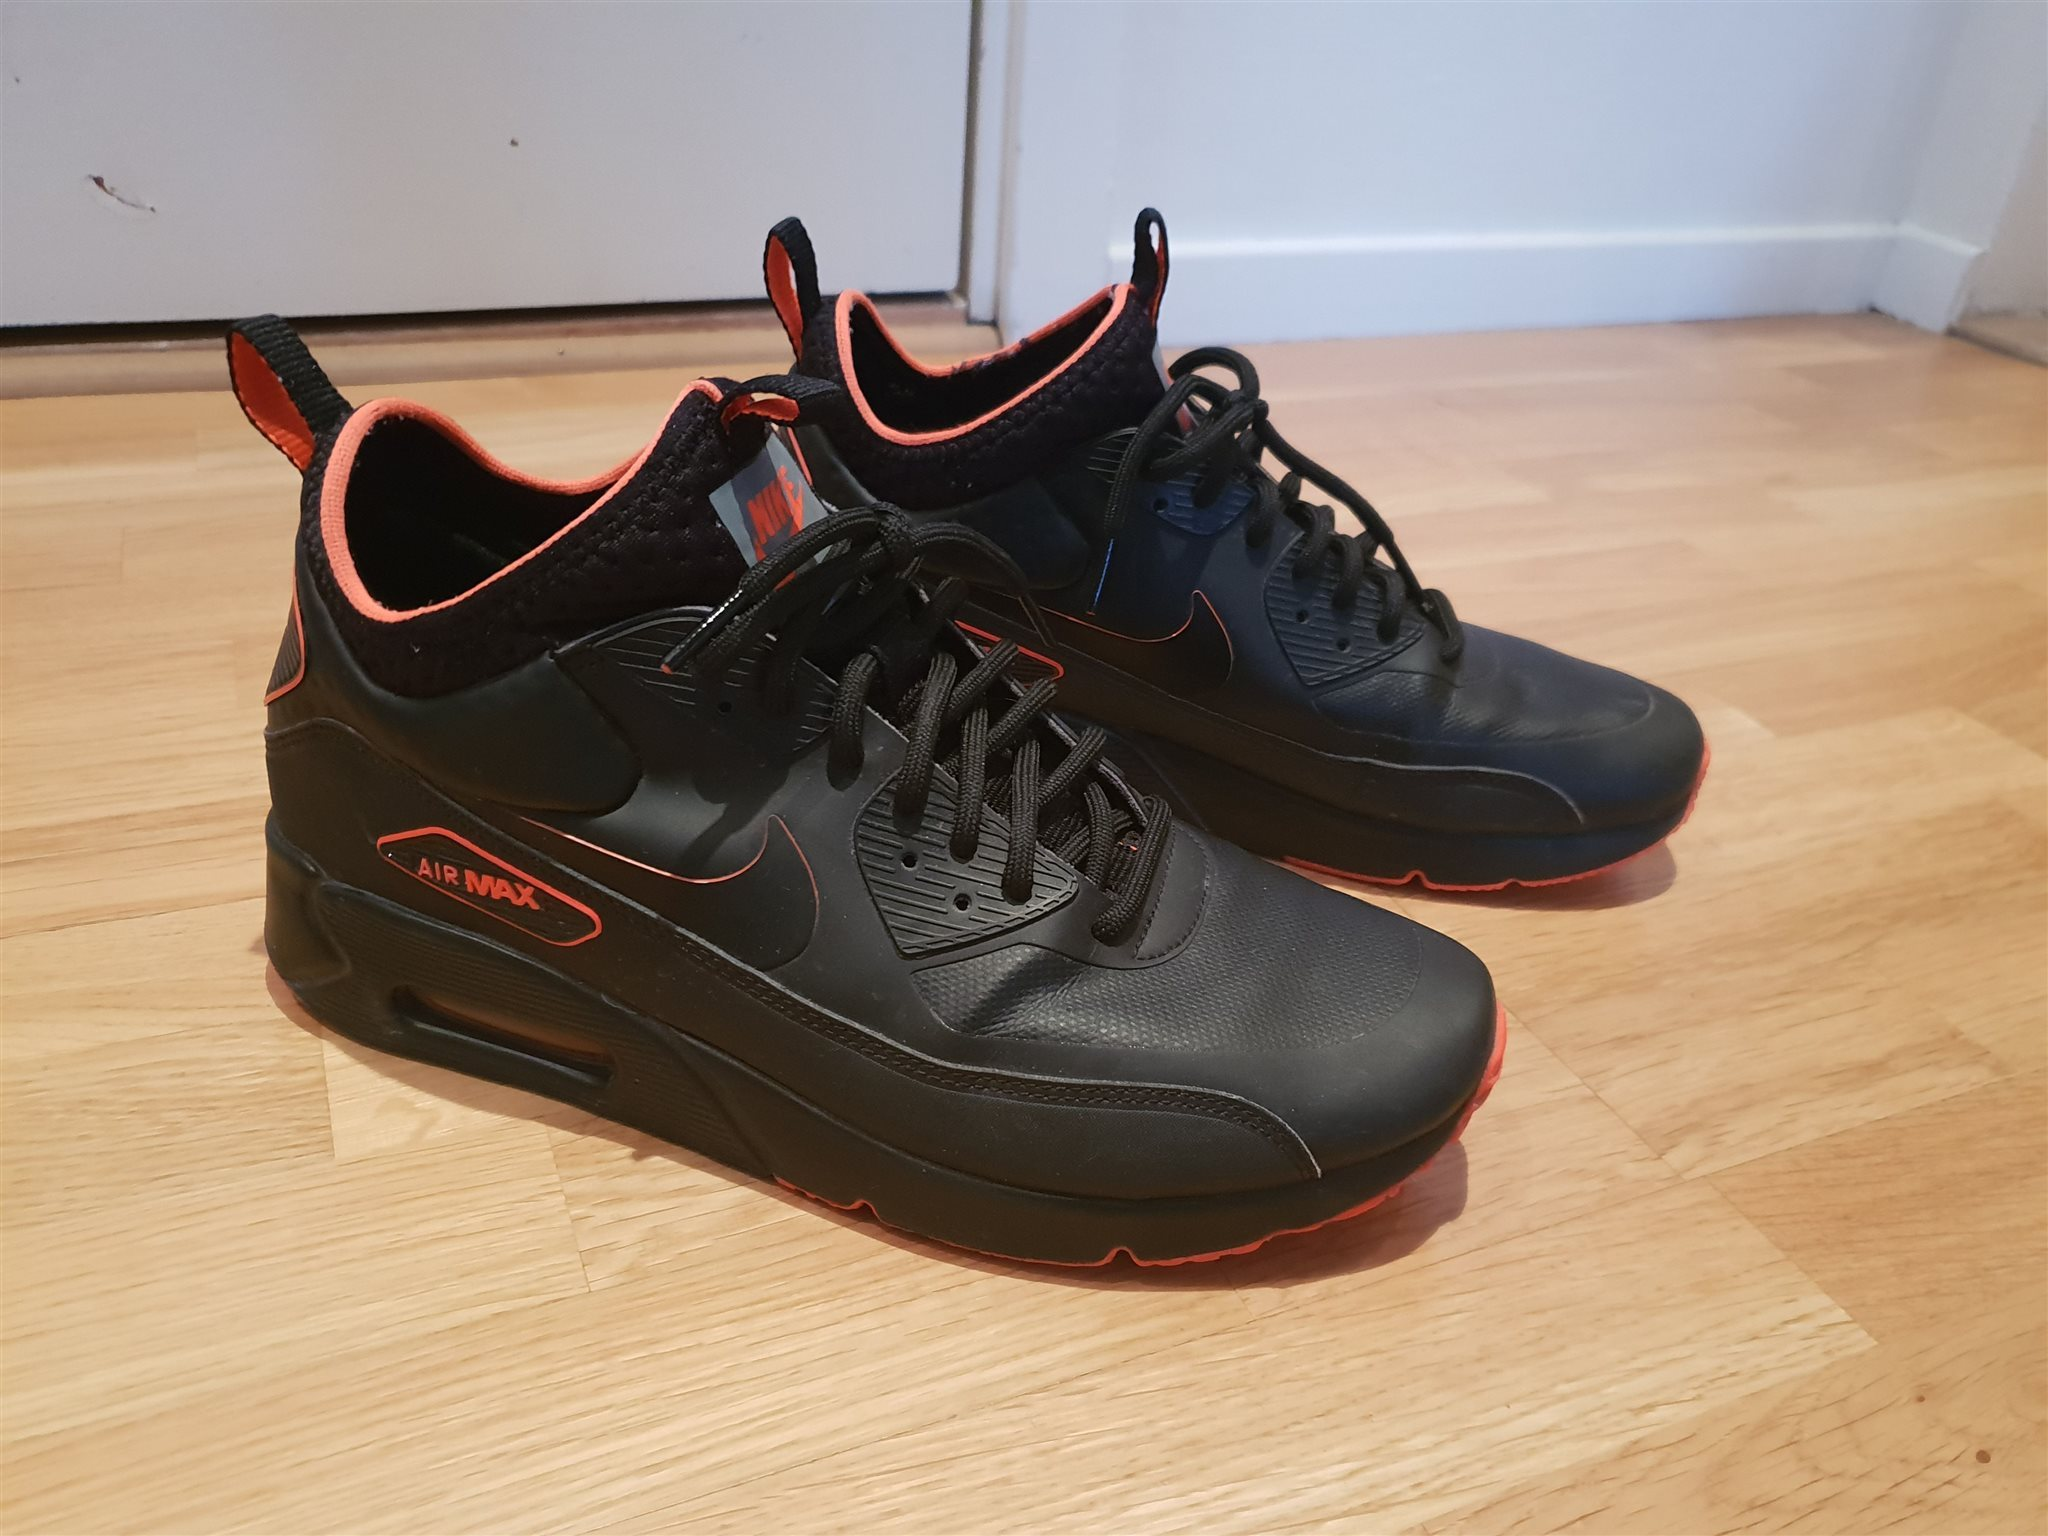 newest 2ed97 1c685 Nike Air Max 90 Mid winter, storlek 42.5